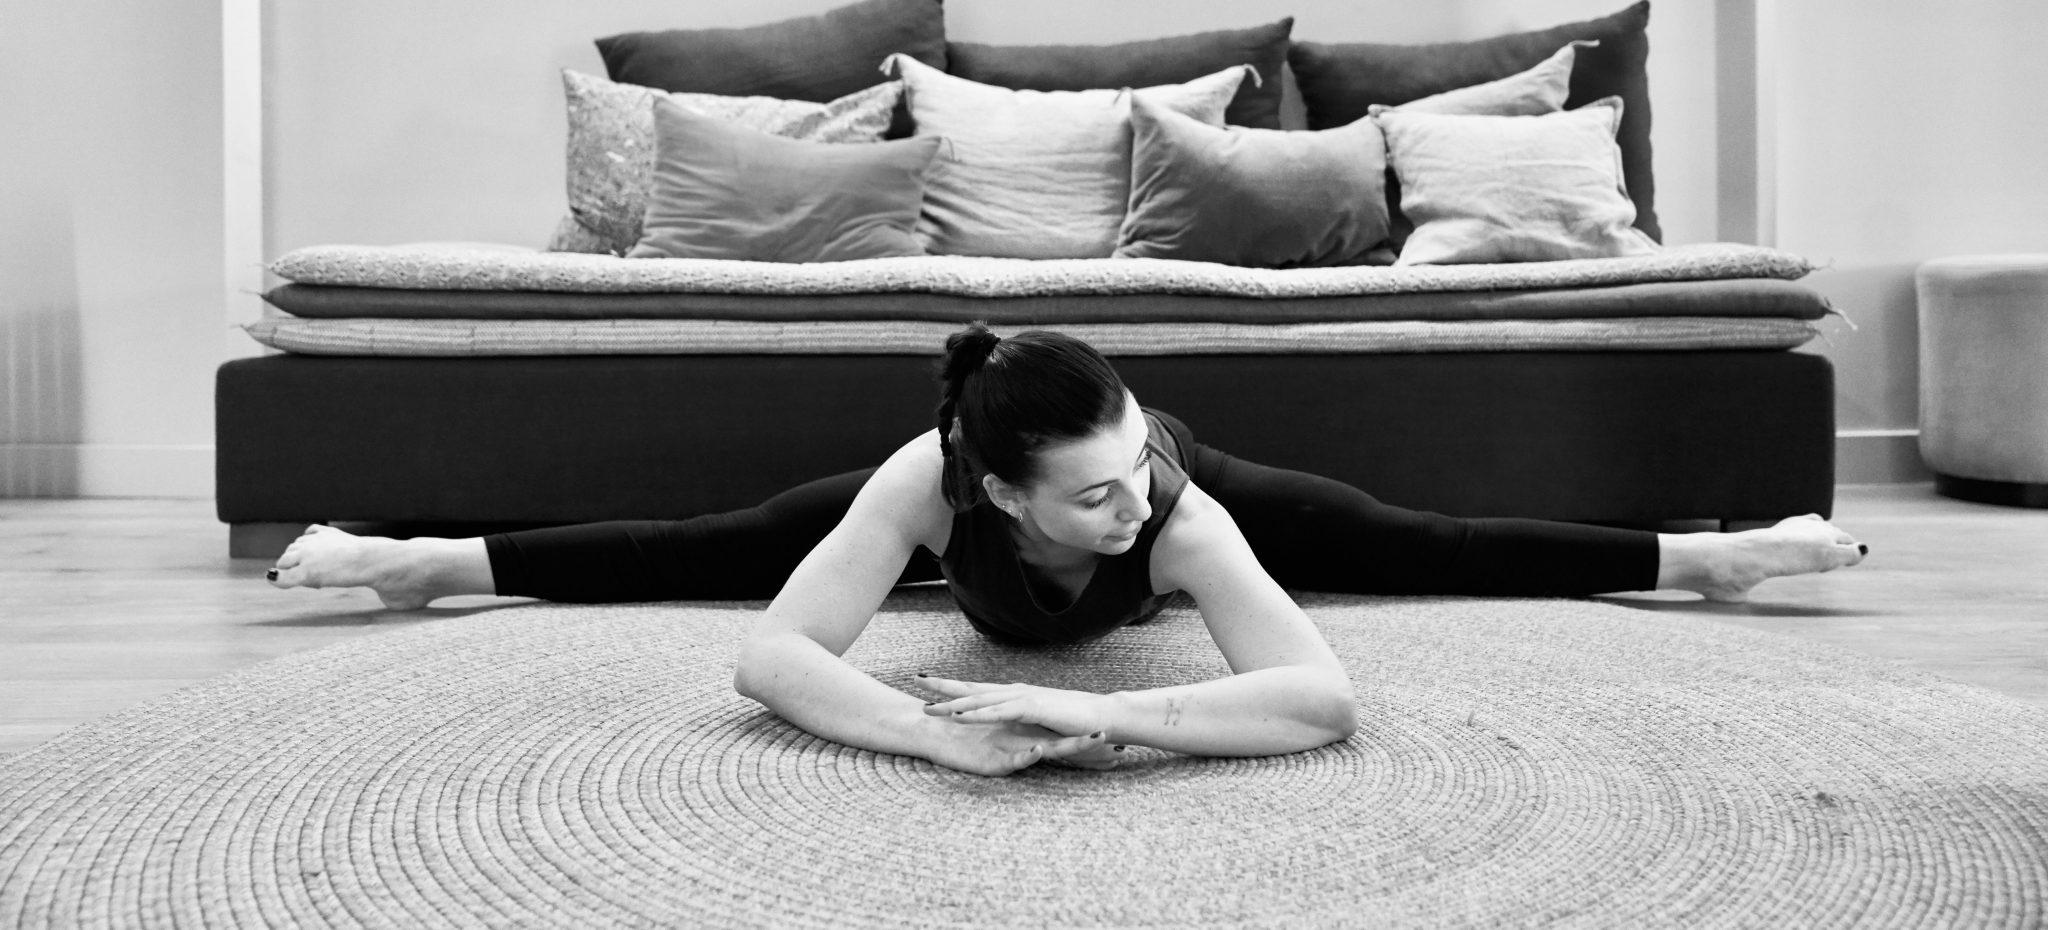 Aparigraha en Yoga